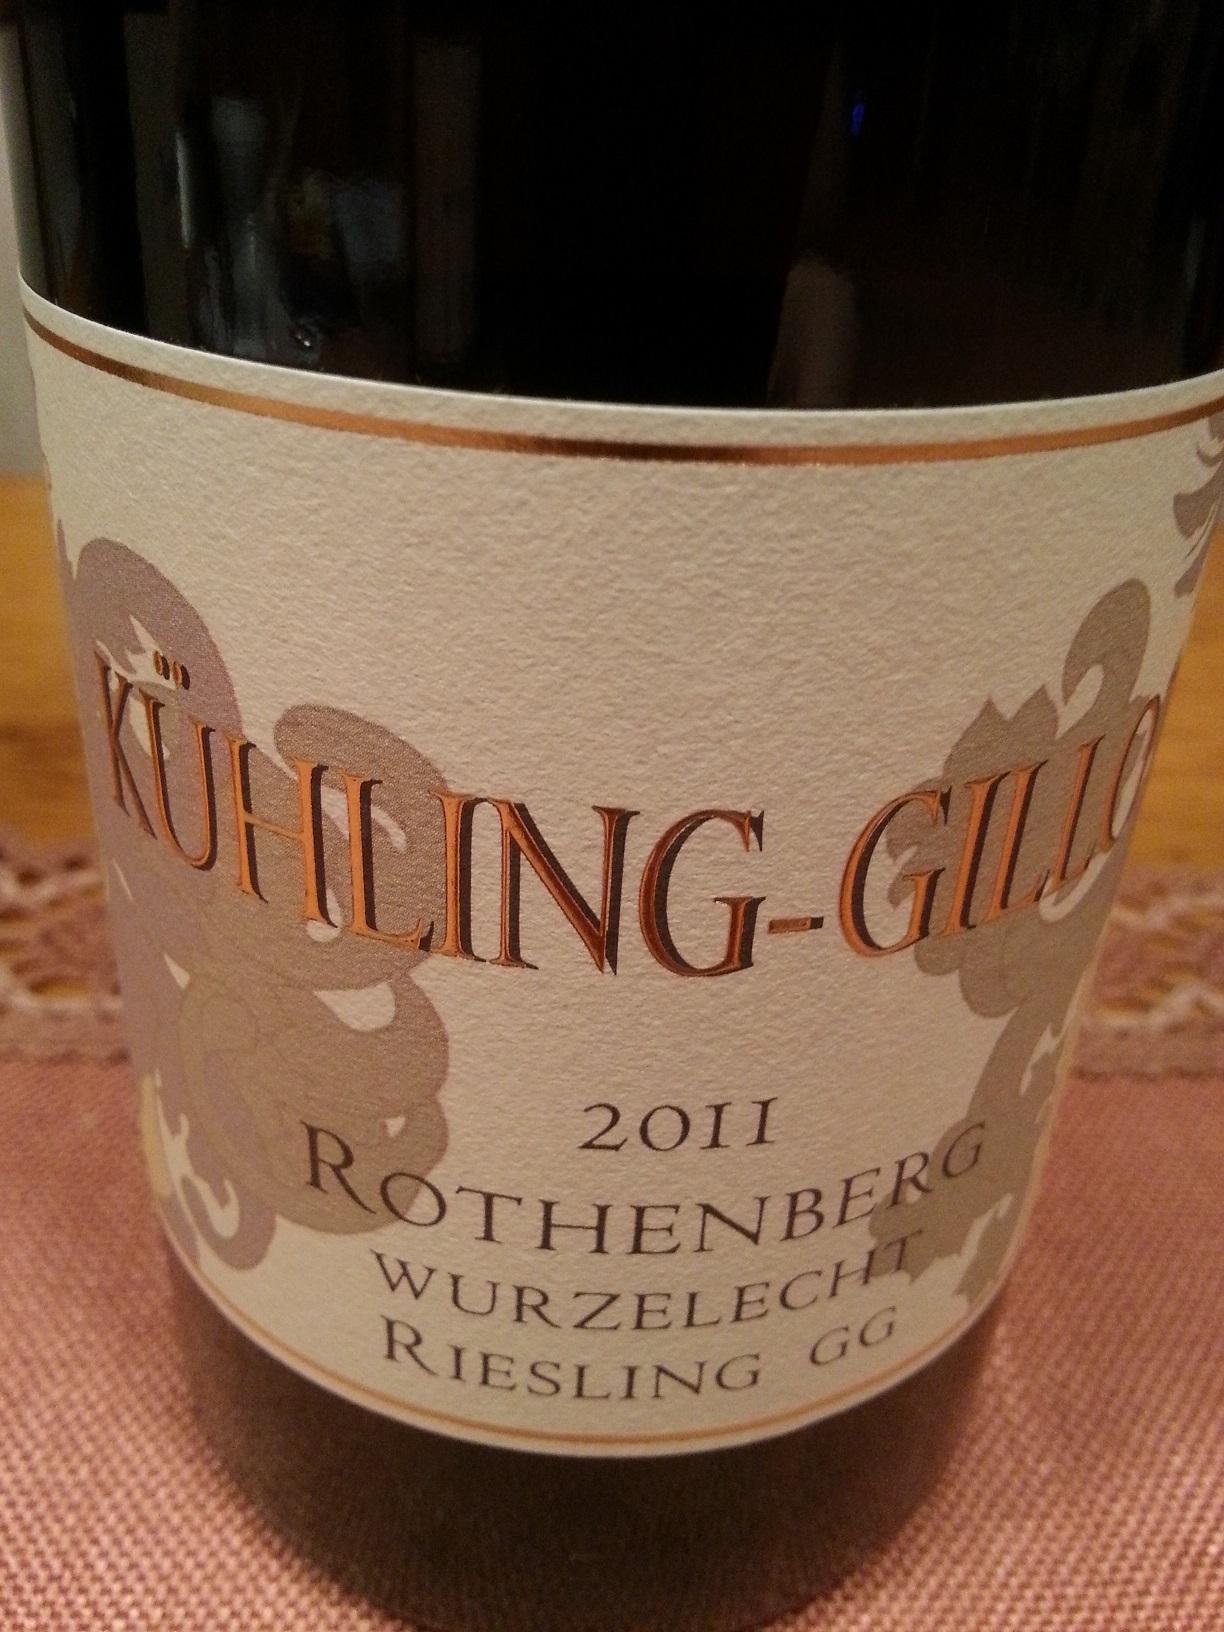 2011 Riesling Rothenberg Wurzelecht GG | Kühling-Gillot